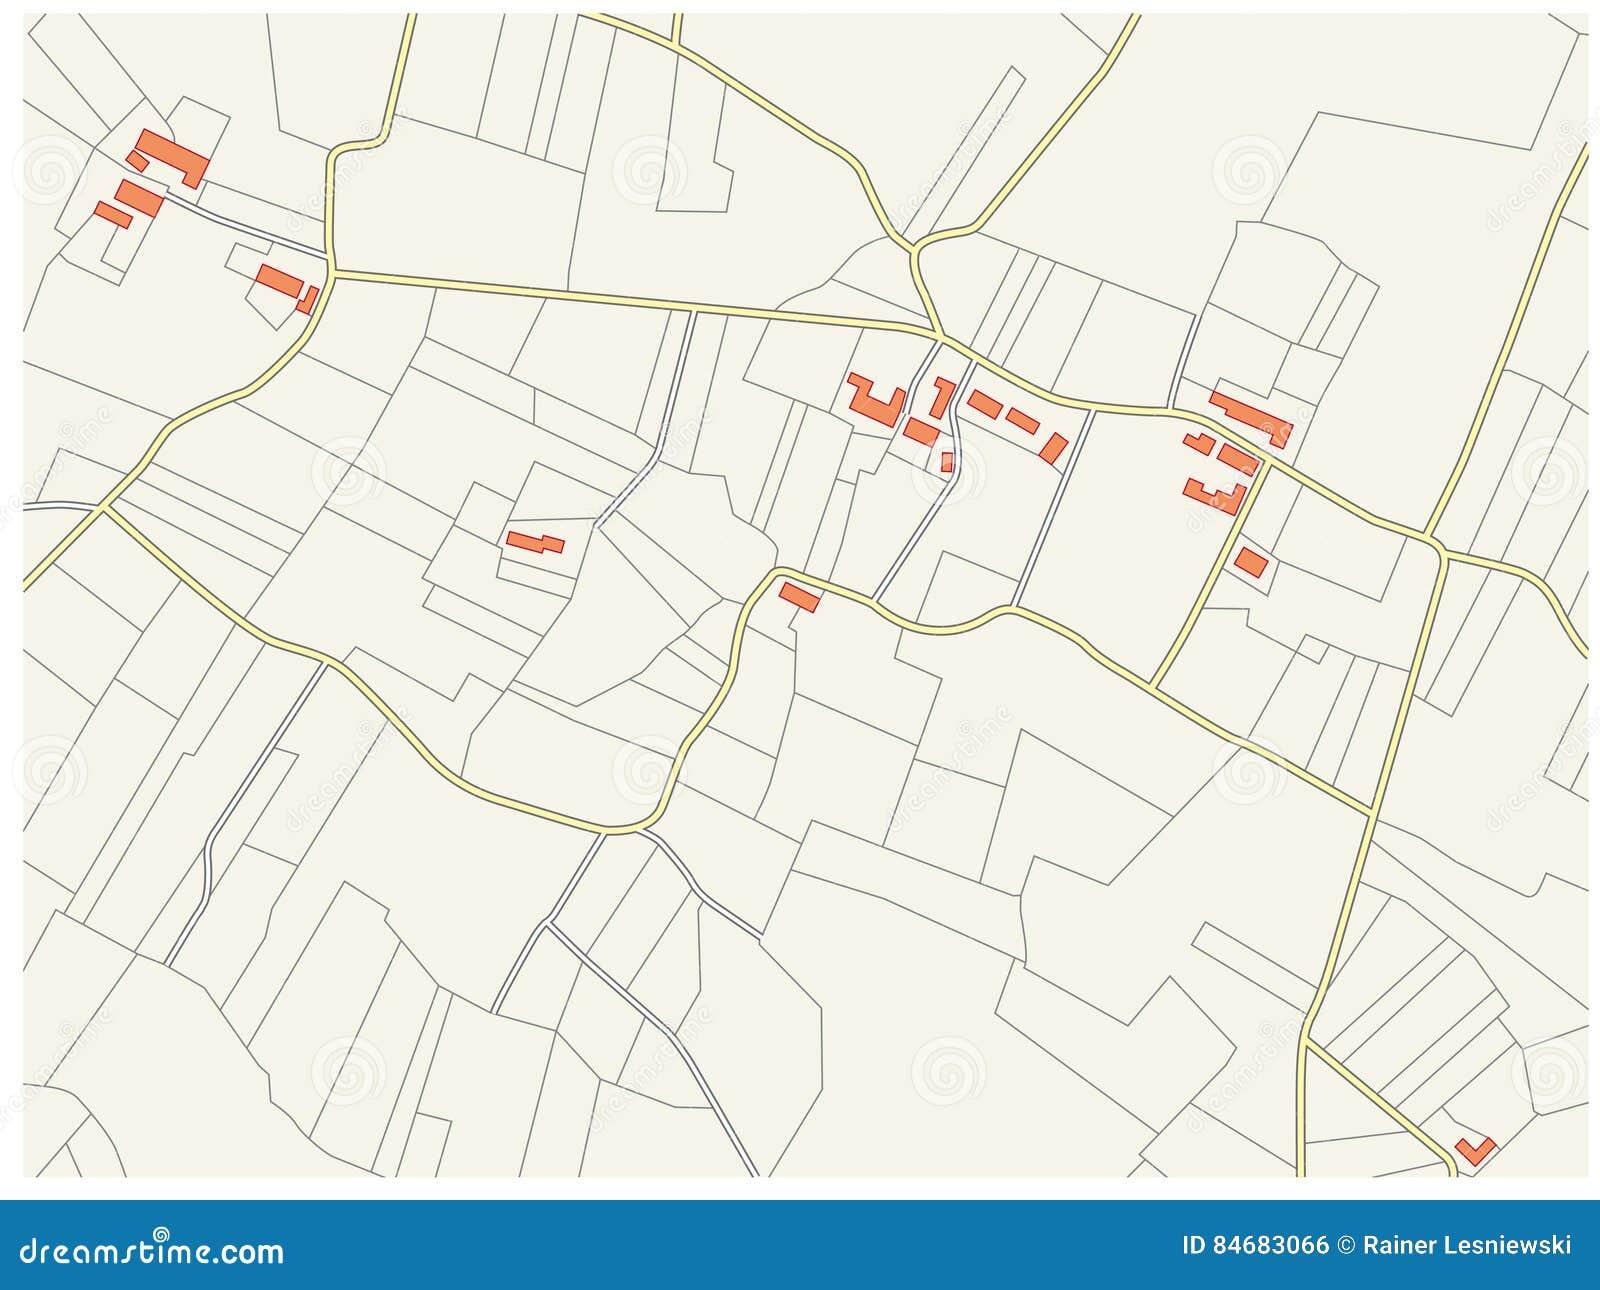 Imaginary Cadastre Plan Stock Vector Illustration Of Cartography 84683066